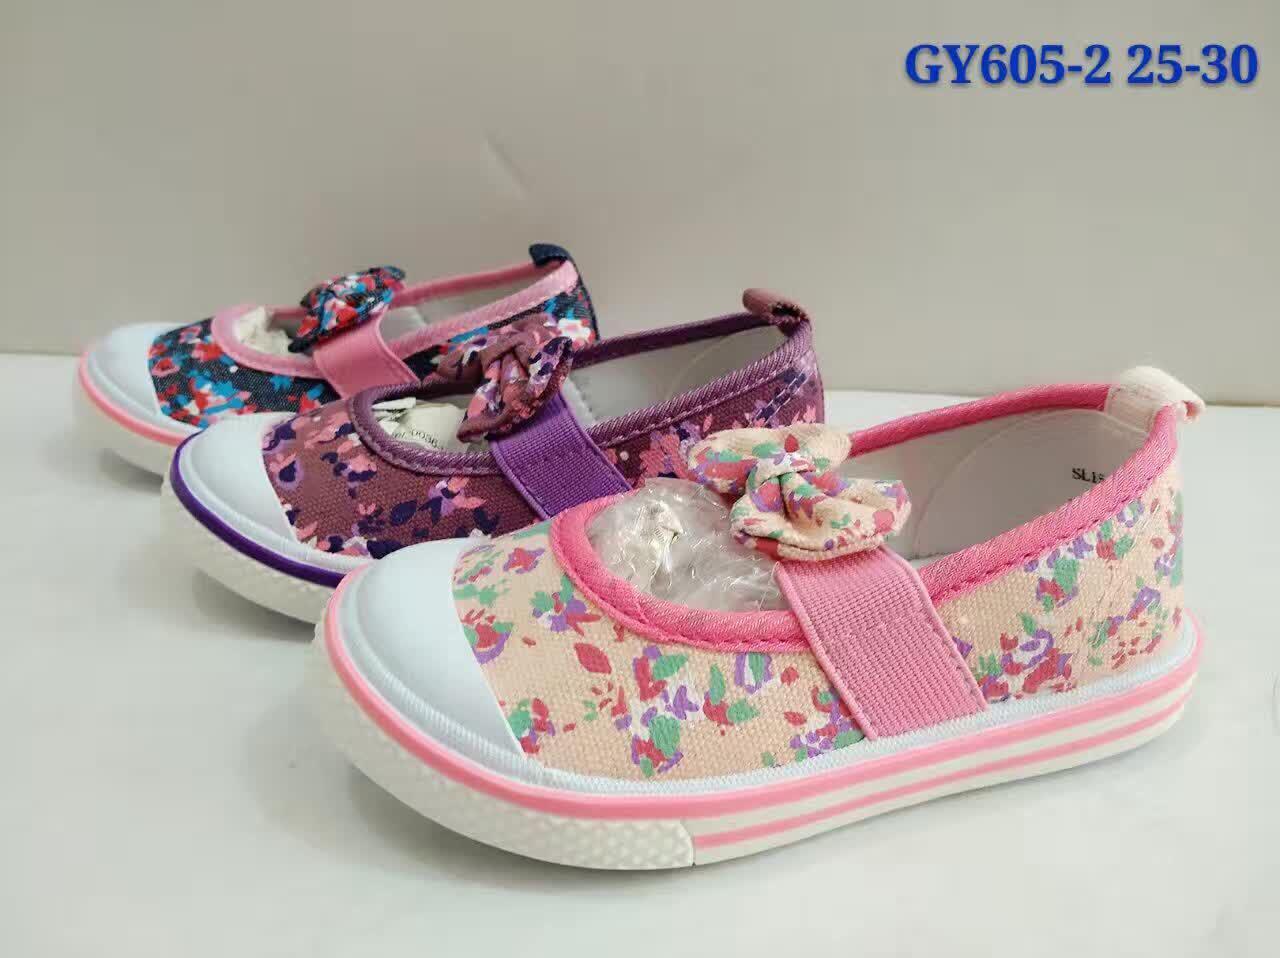 ed647b5f3 Текстильная обувь для девочек, размеры 25-30., арт. GY605-2, цена ...